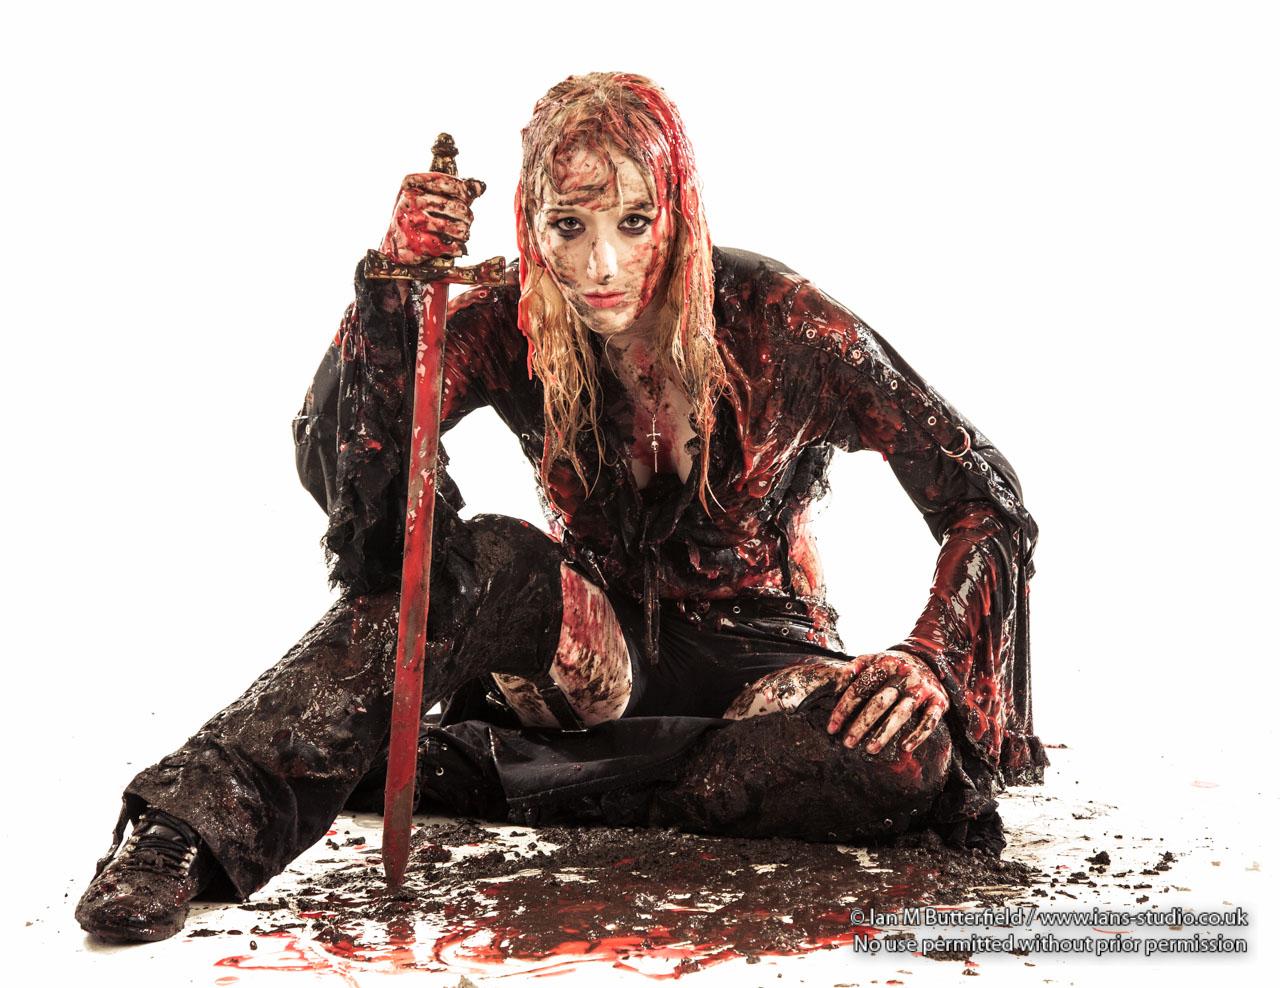 Bloody and Muddy Warrior